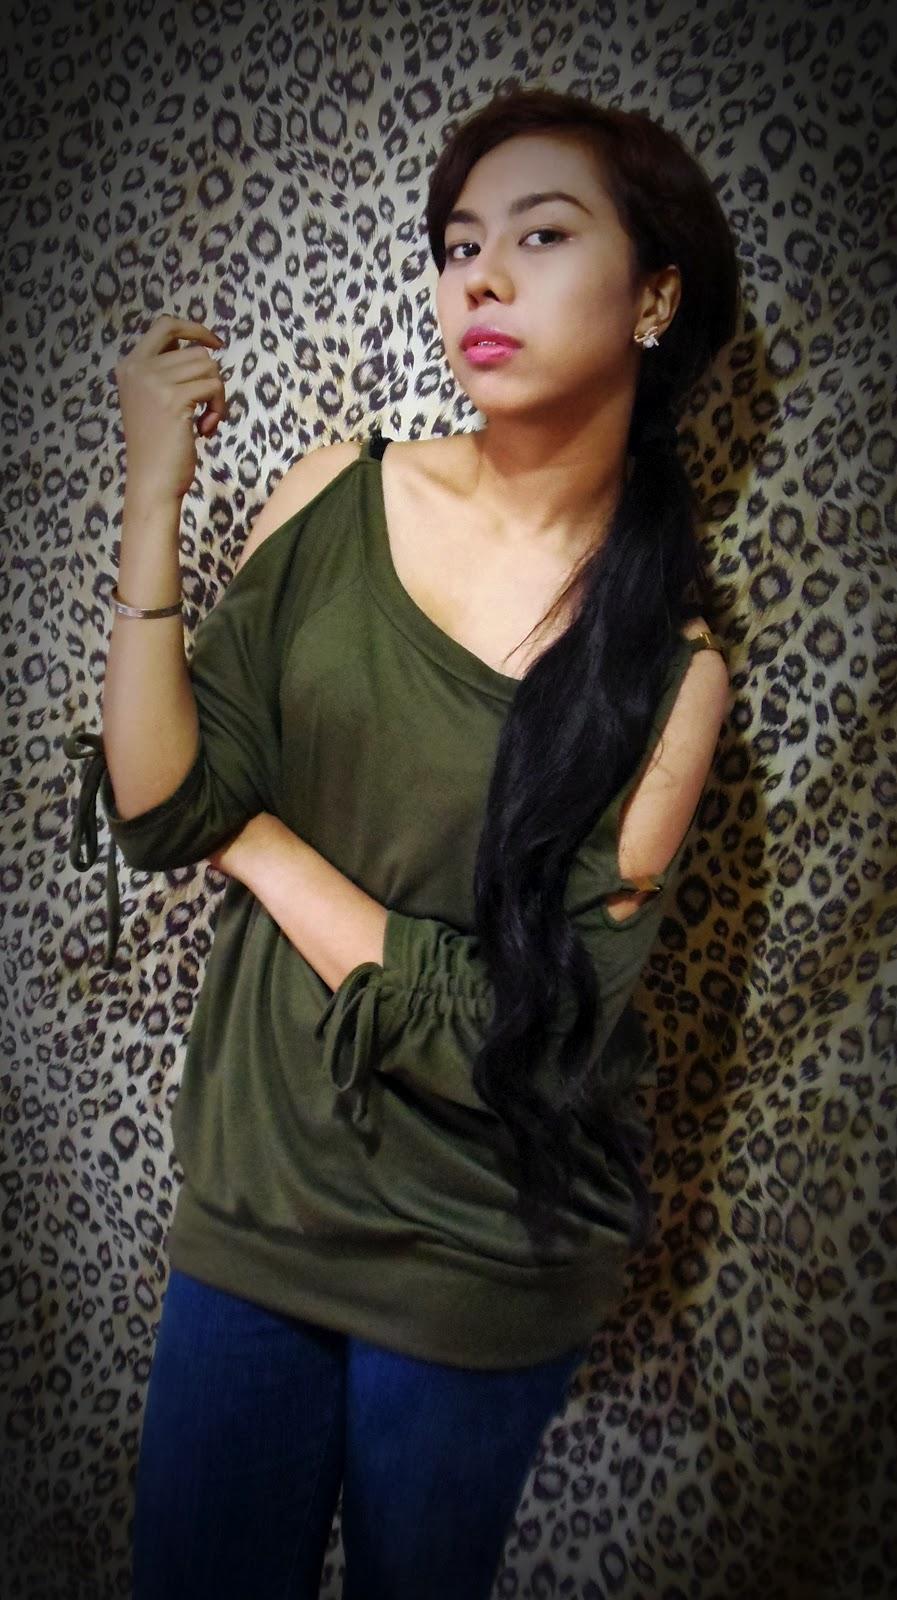 lee hong ki girlfriend 2012